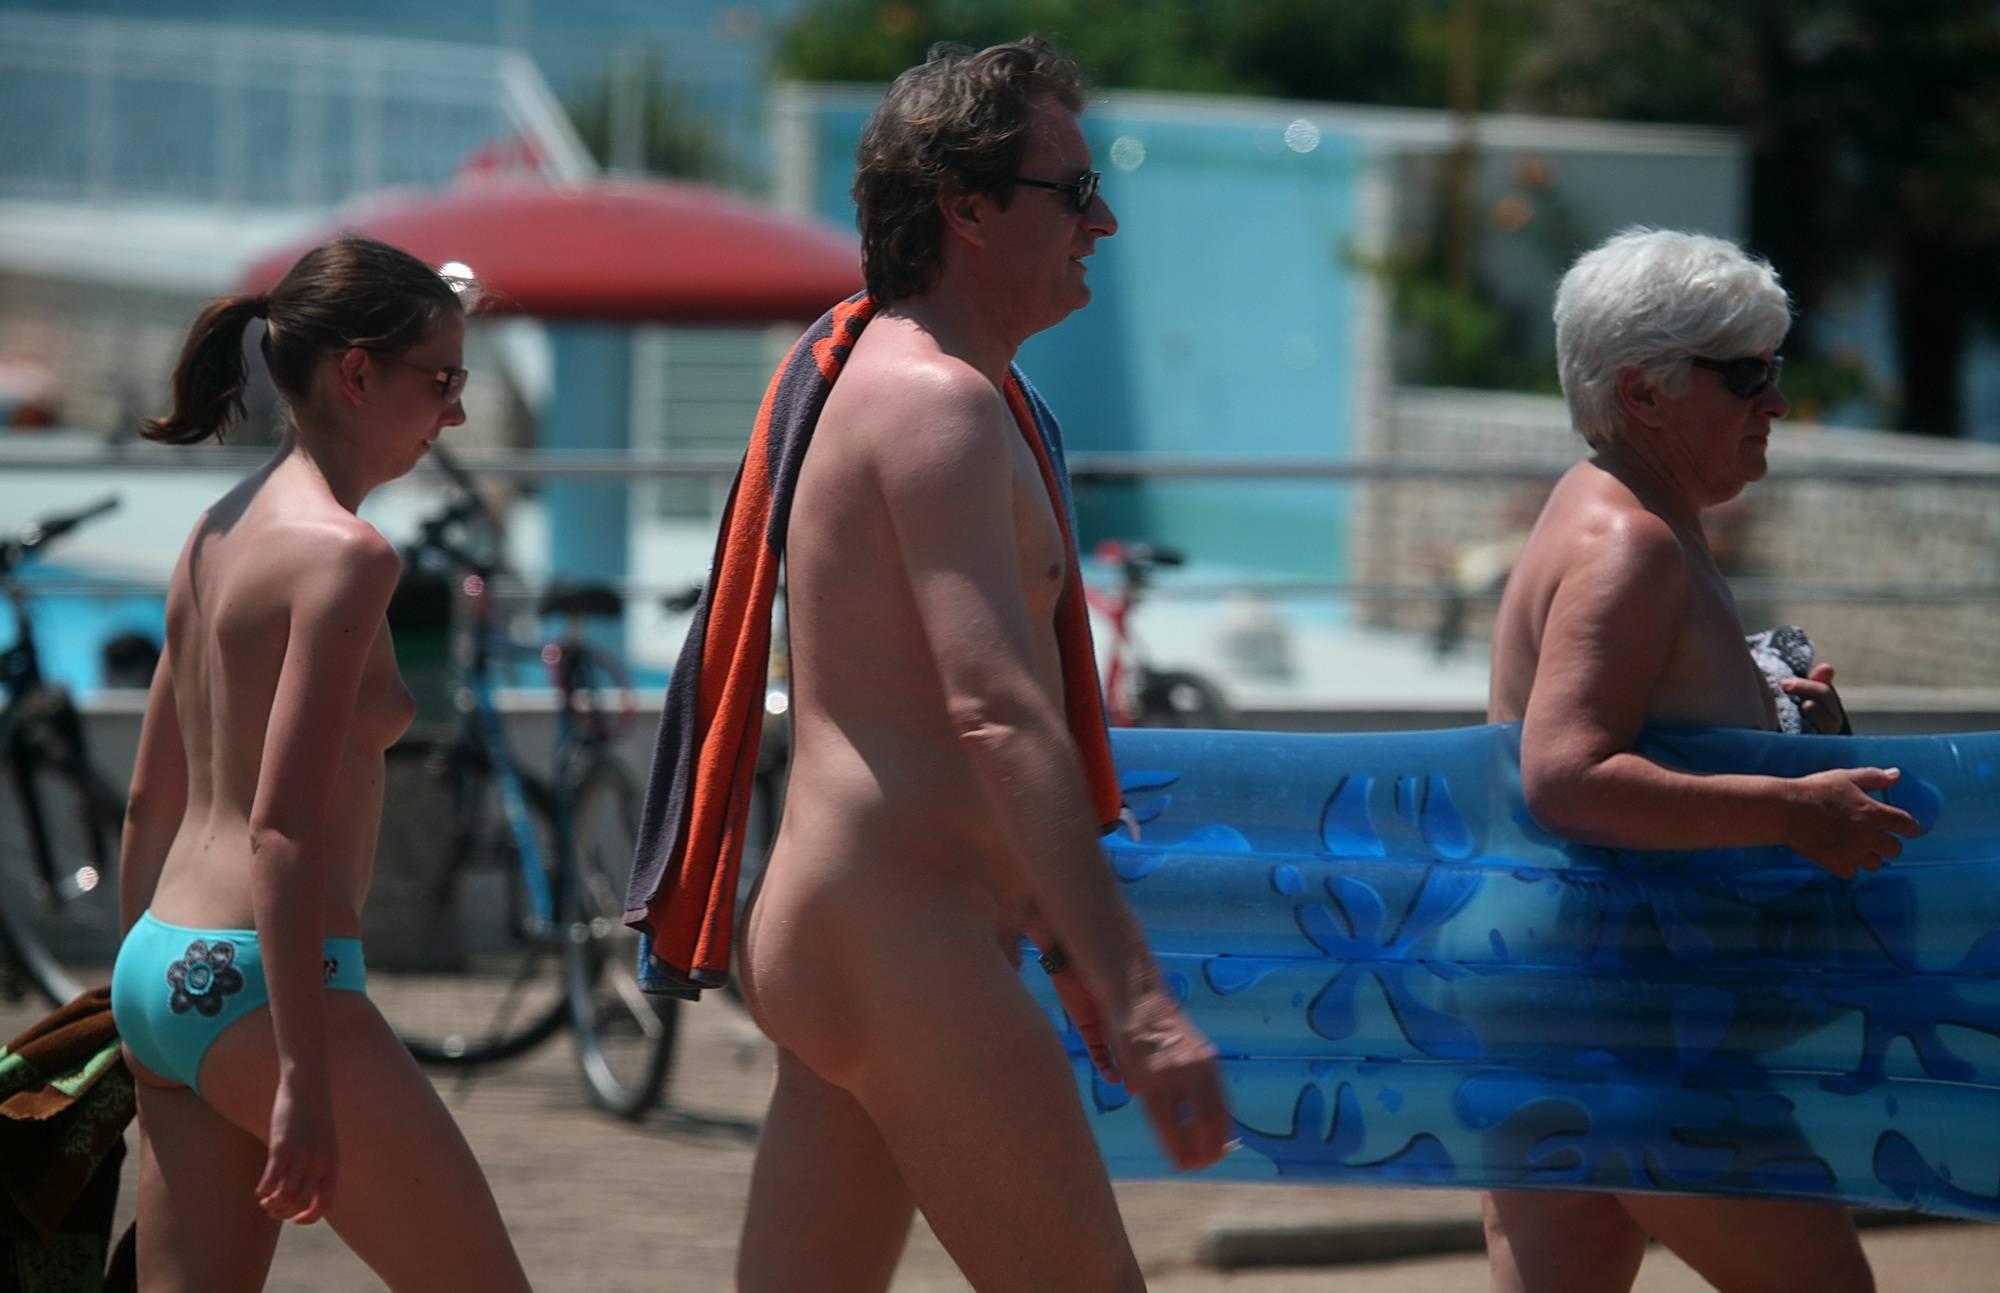 Nudist Photos Blue Ocean Swim Pool - 2